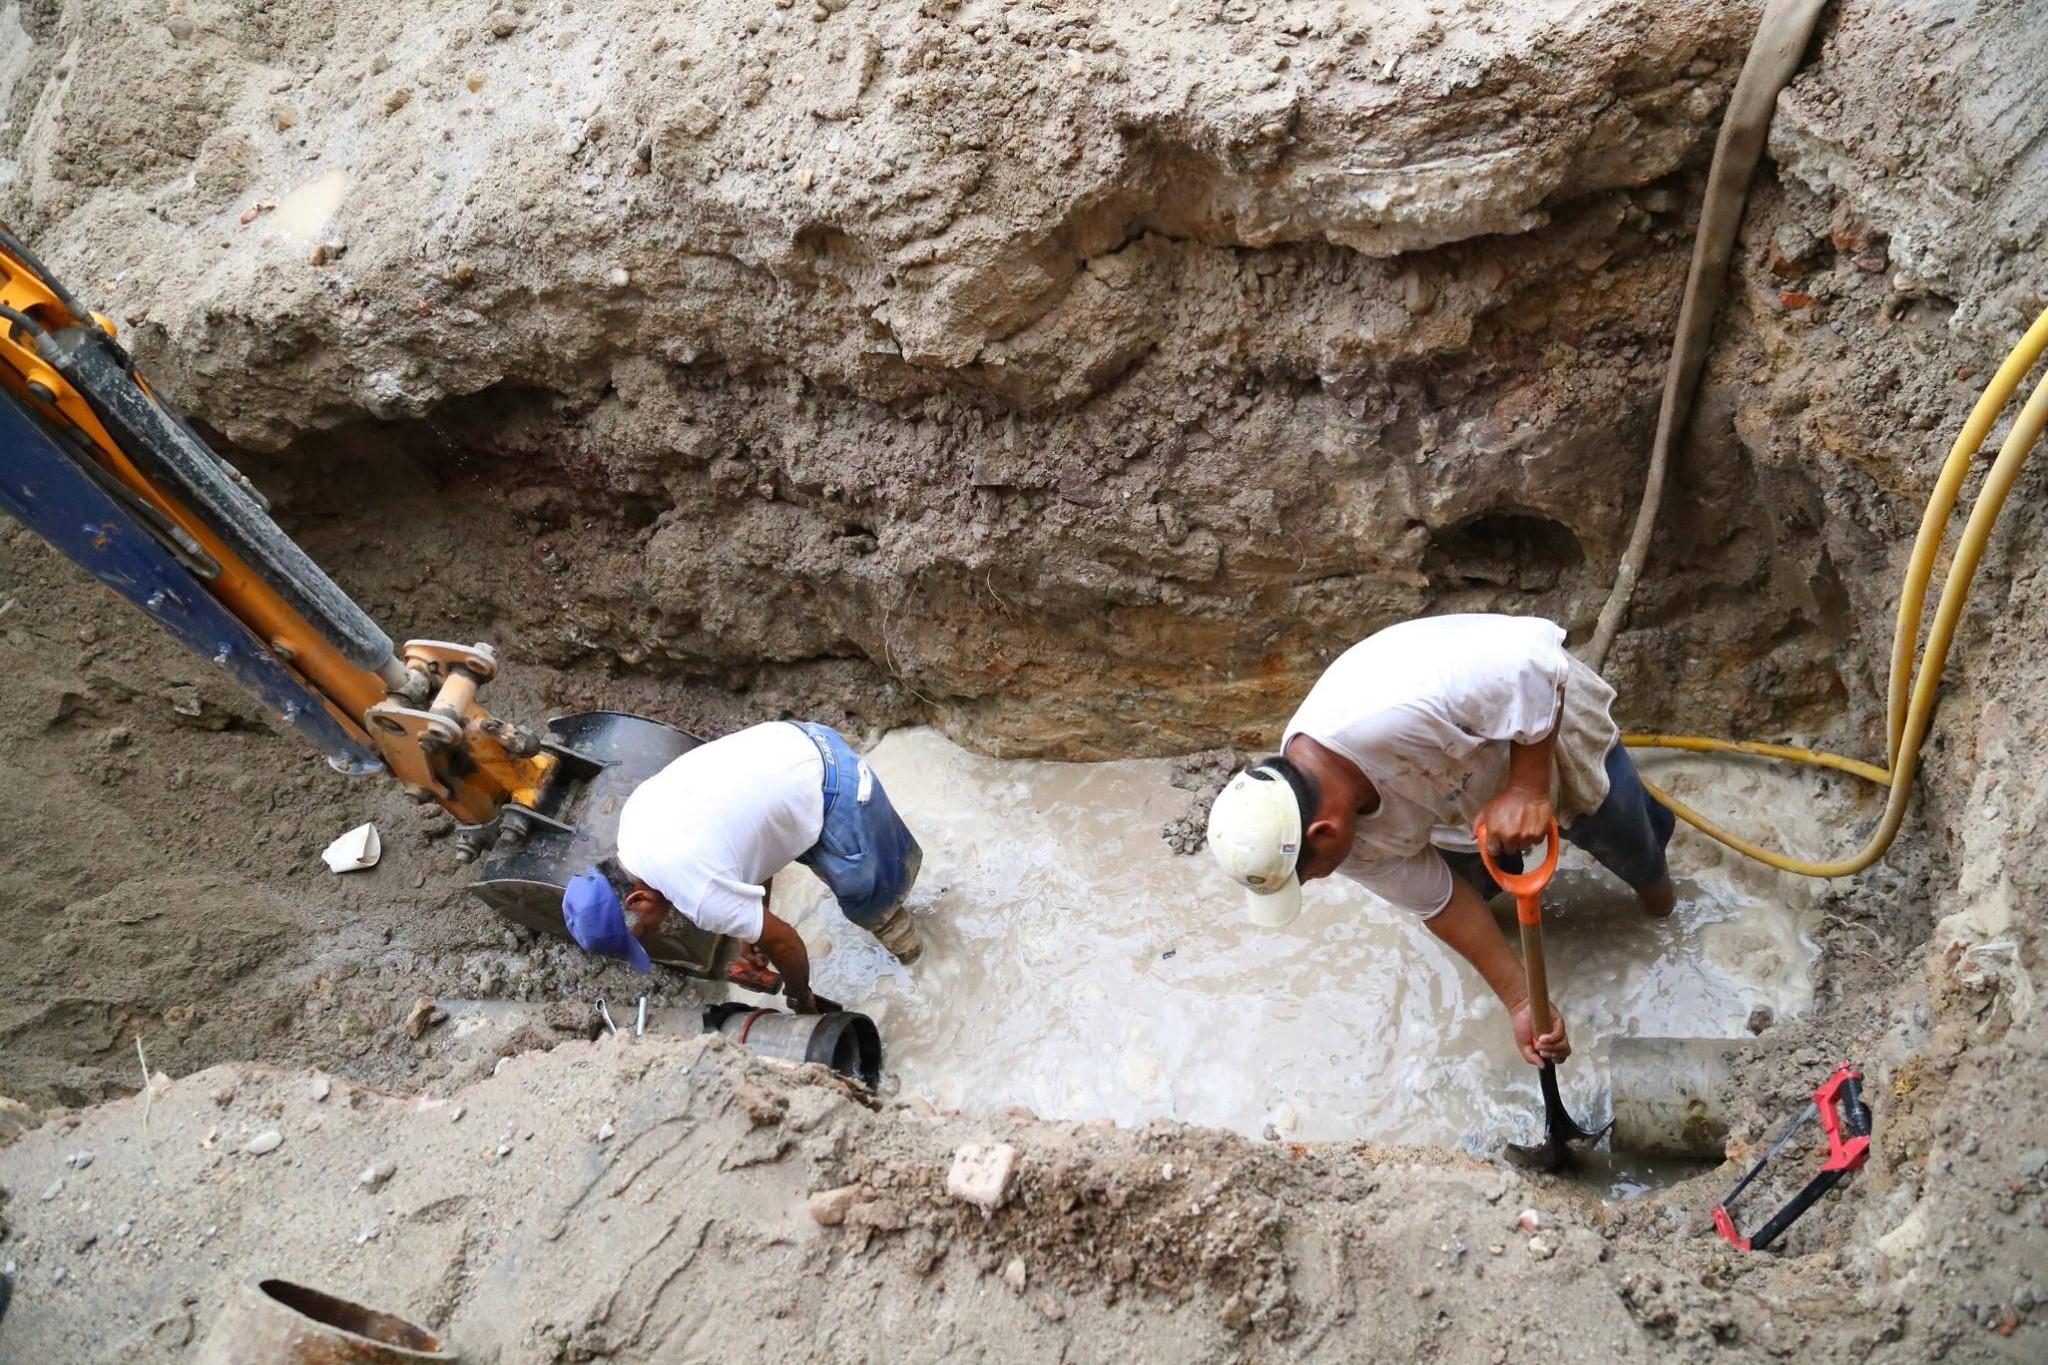 Atendi seapal oportunamente 4 247 fugas de agua potable - Detectores de tuberias de agua ...